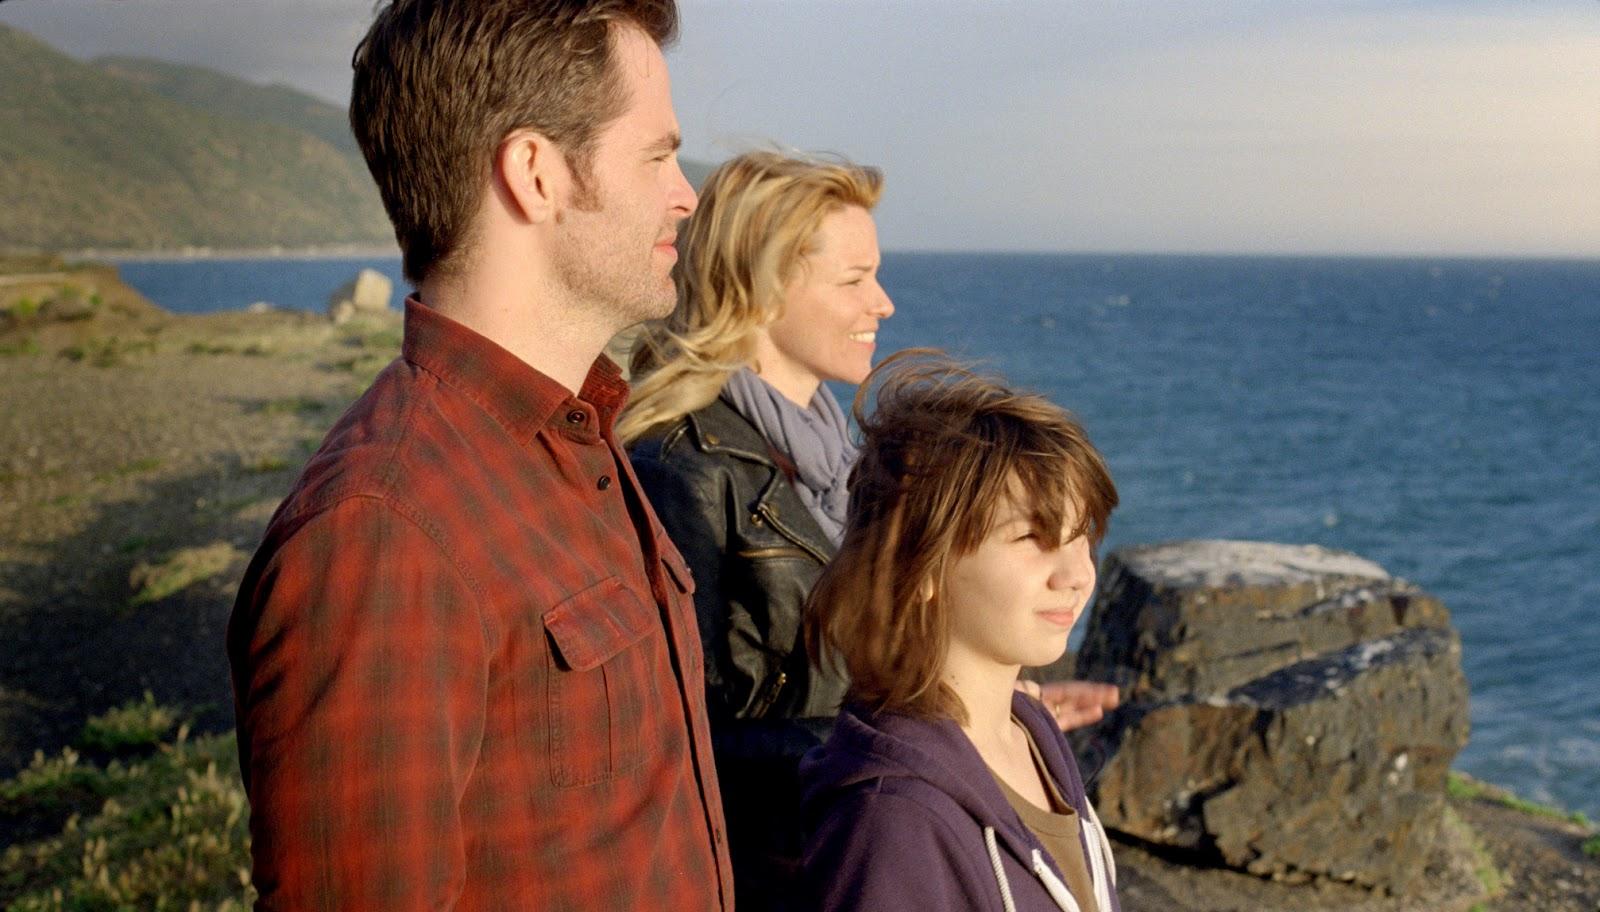 Chris Pine, Elizabeth Banks, and Michael Hall D'Addario